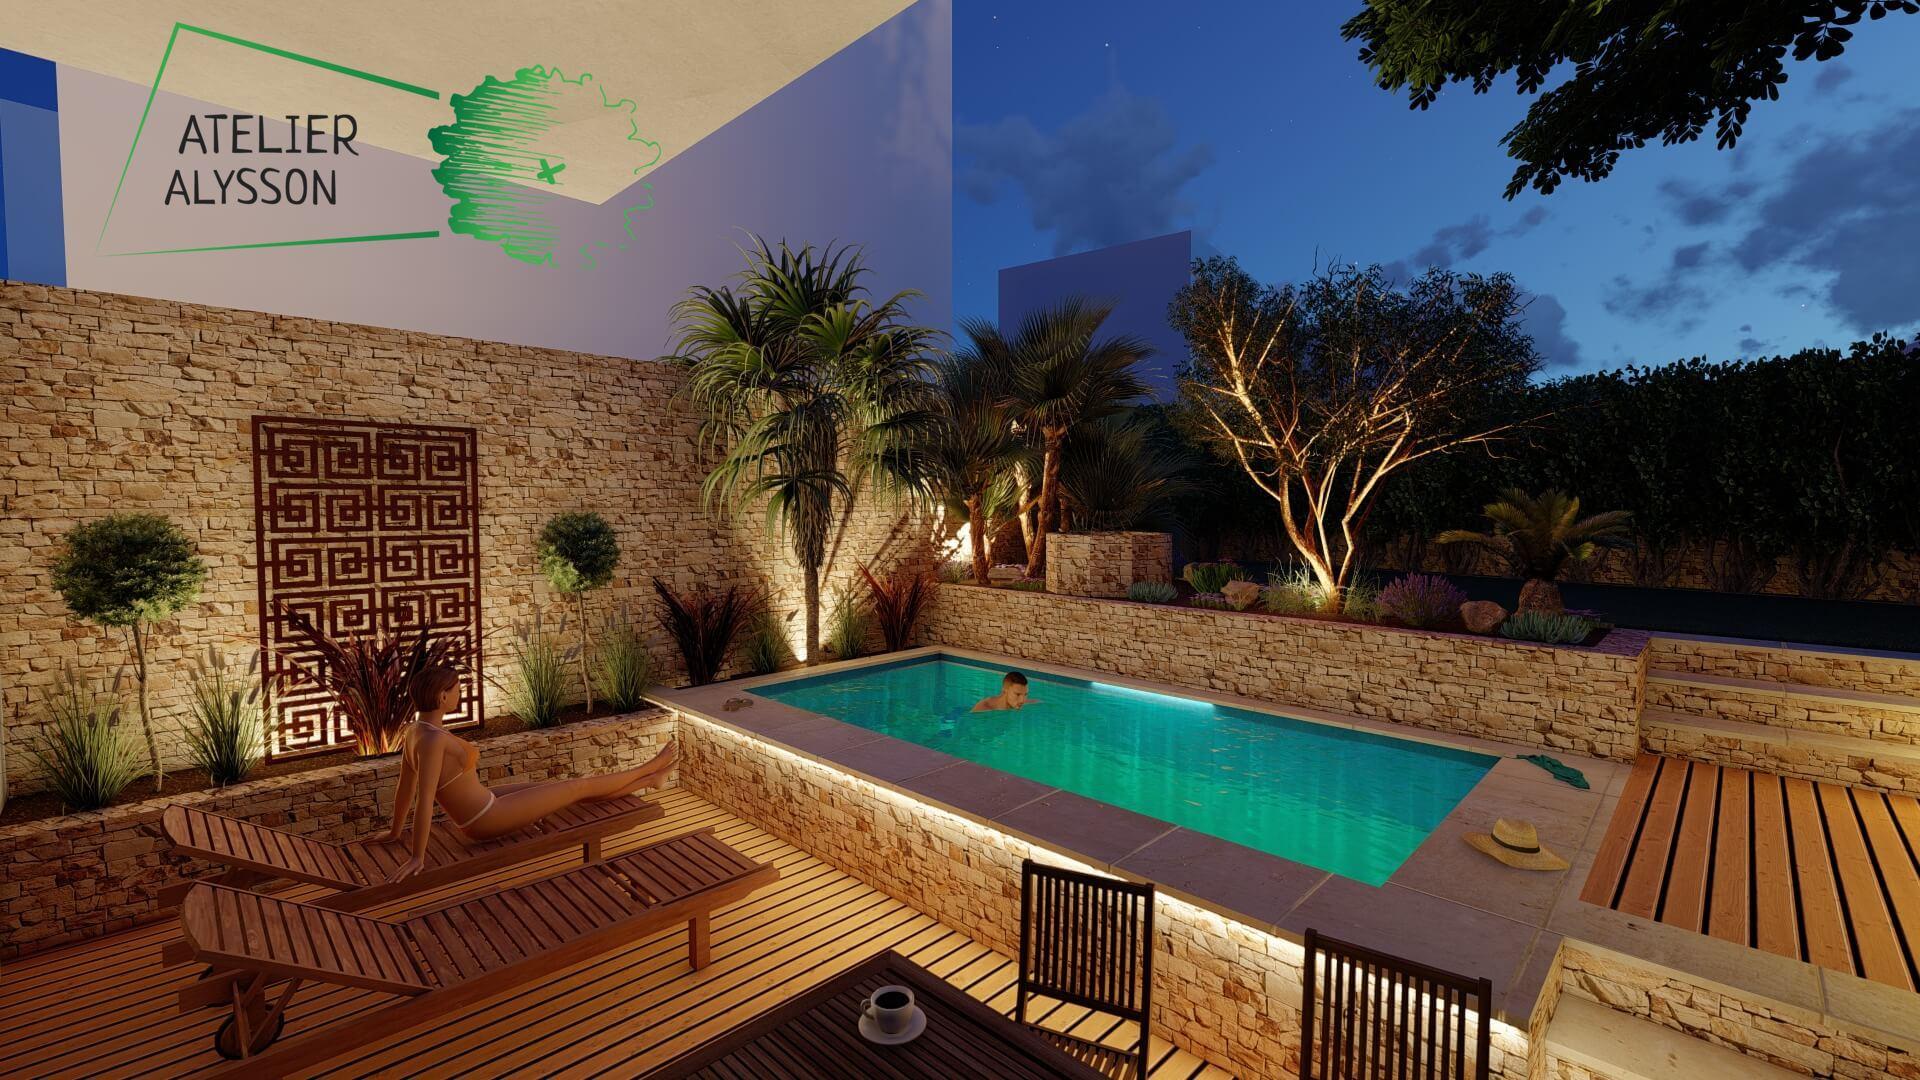 Jardin-a-etages-piscine-nuit-3